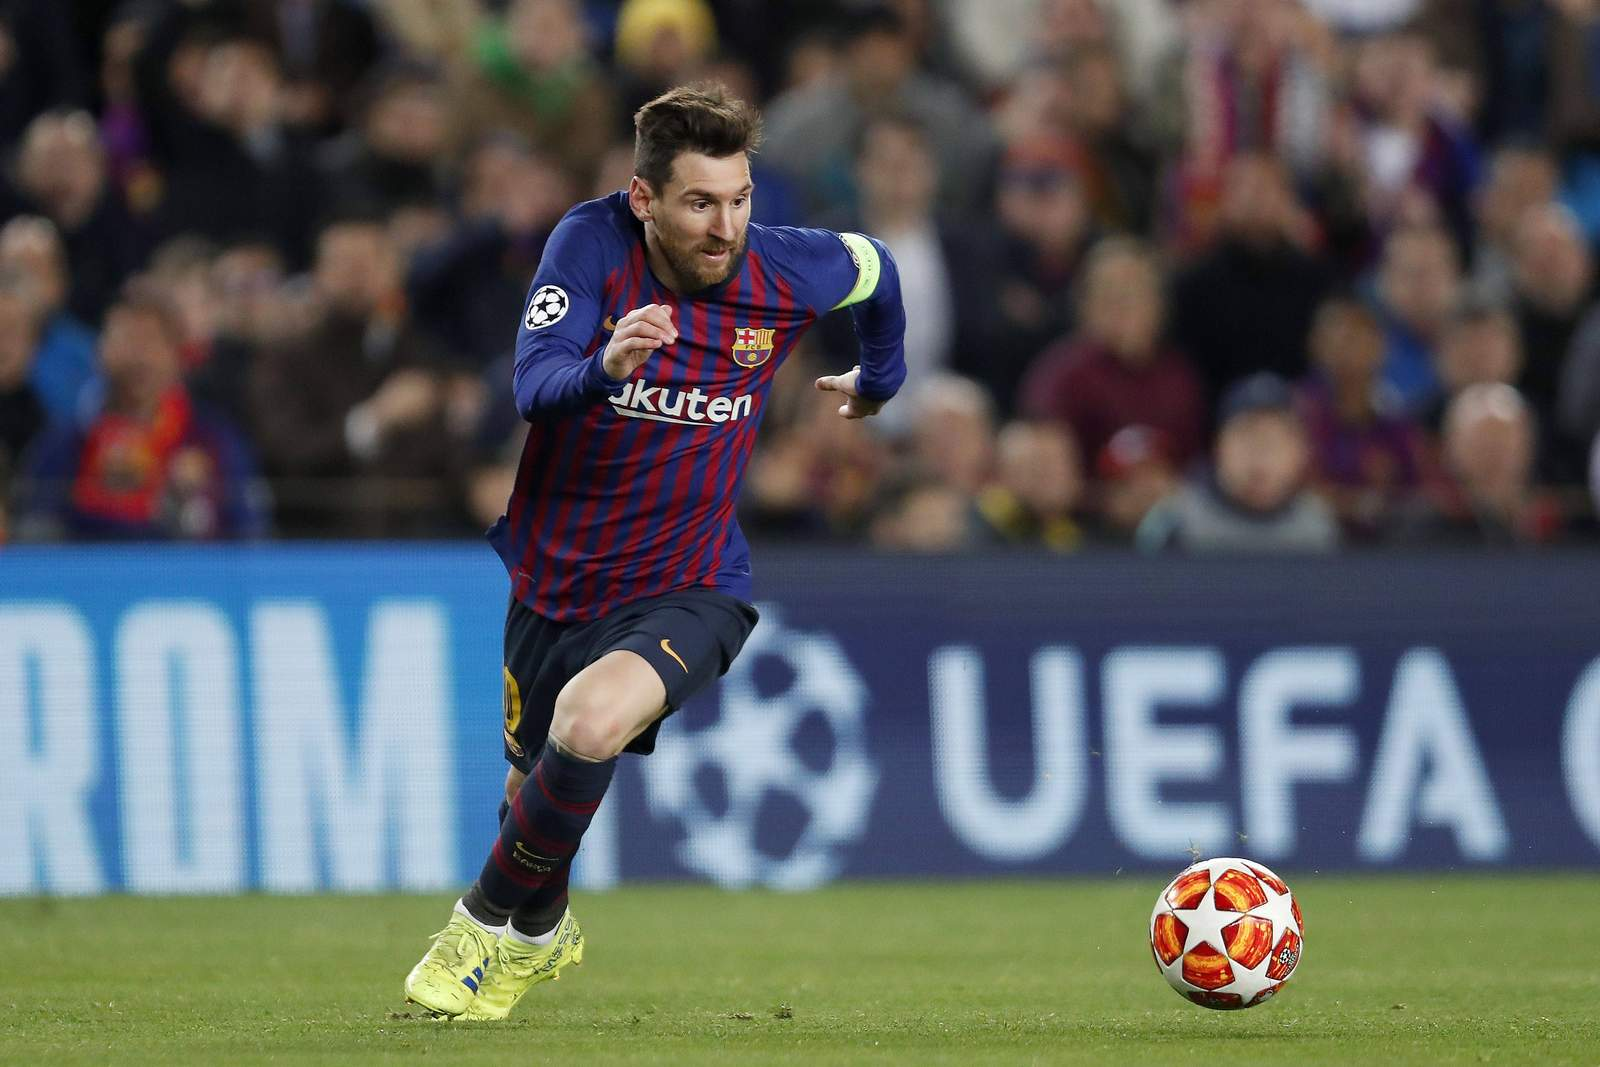 lionel-messi-fc-barcelona-champions-league-03-04-2019-imago-vi-images-39345342hjpg